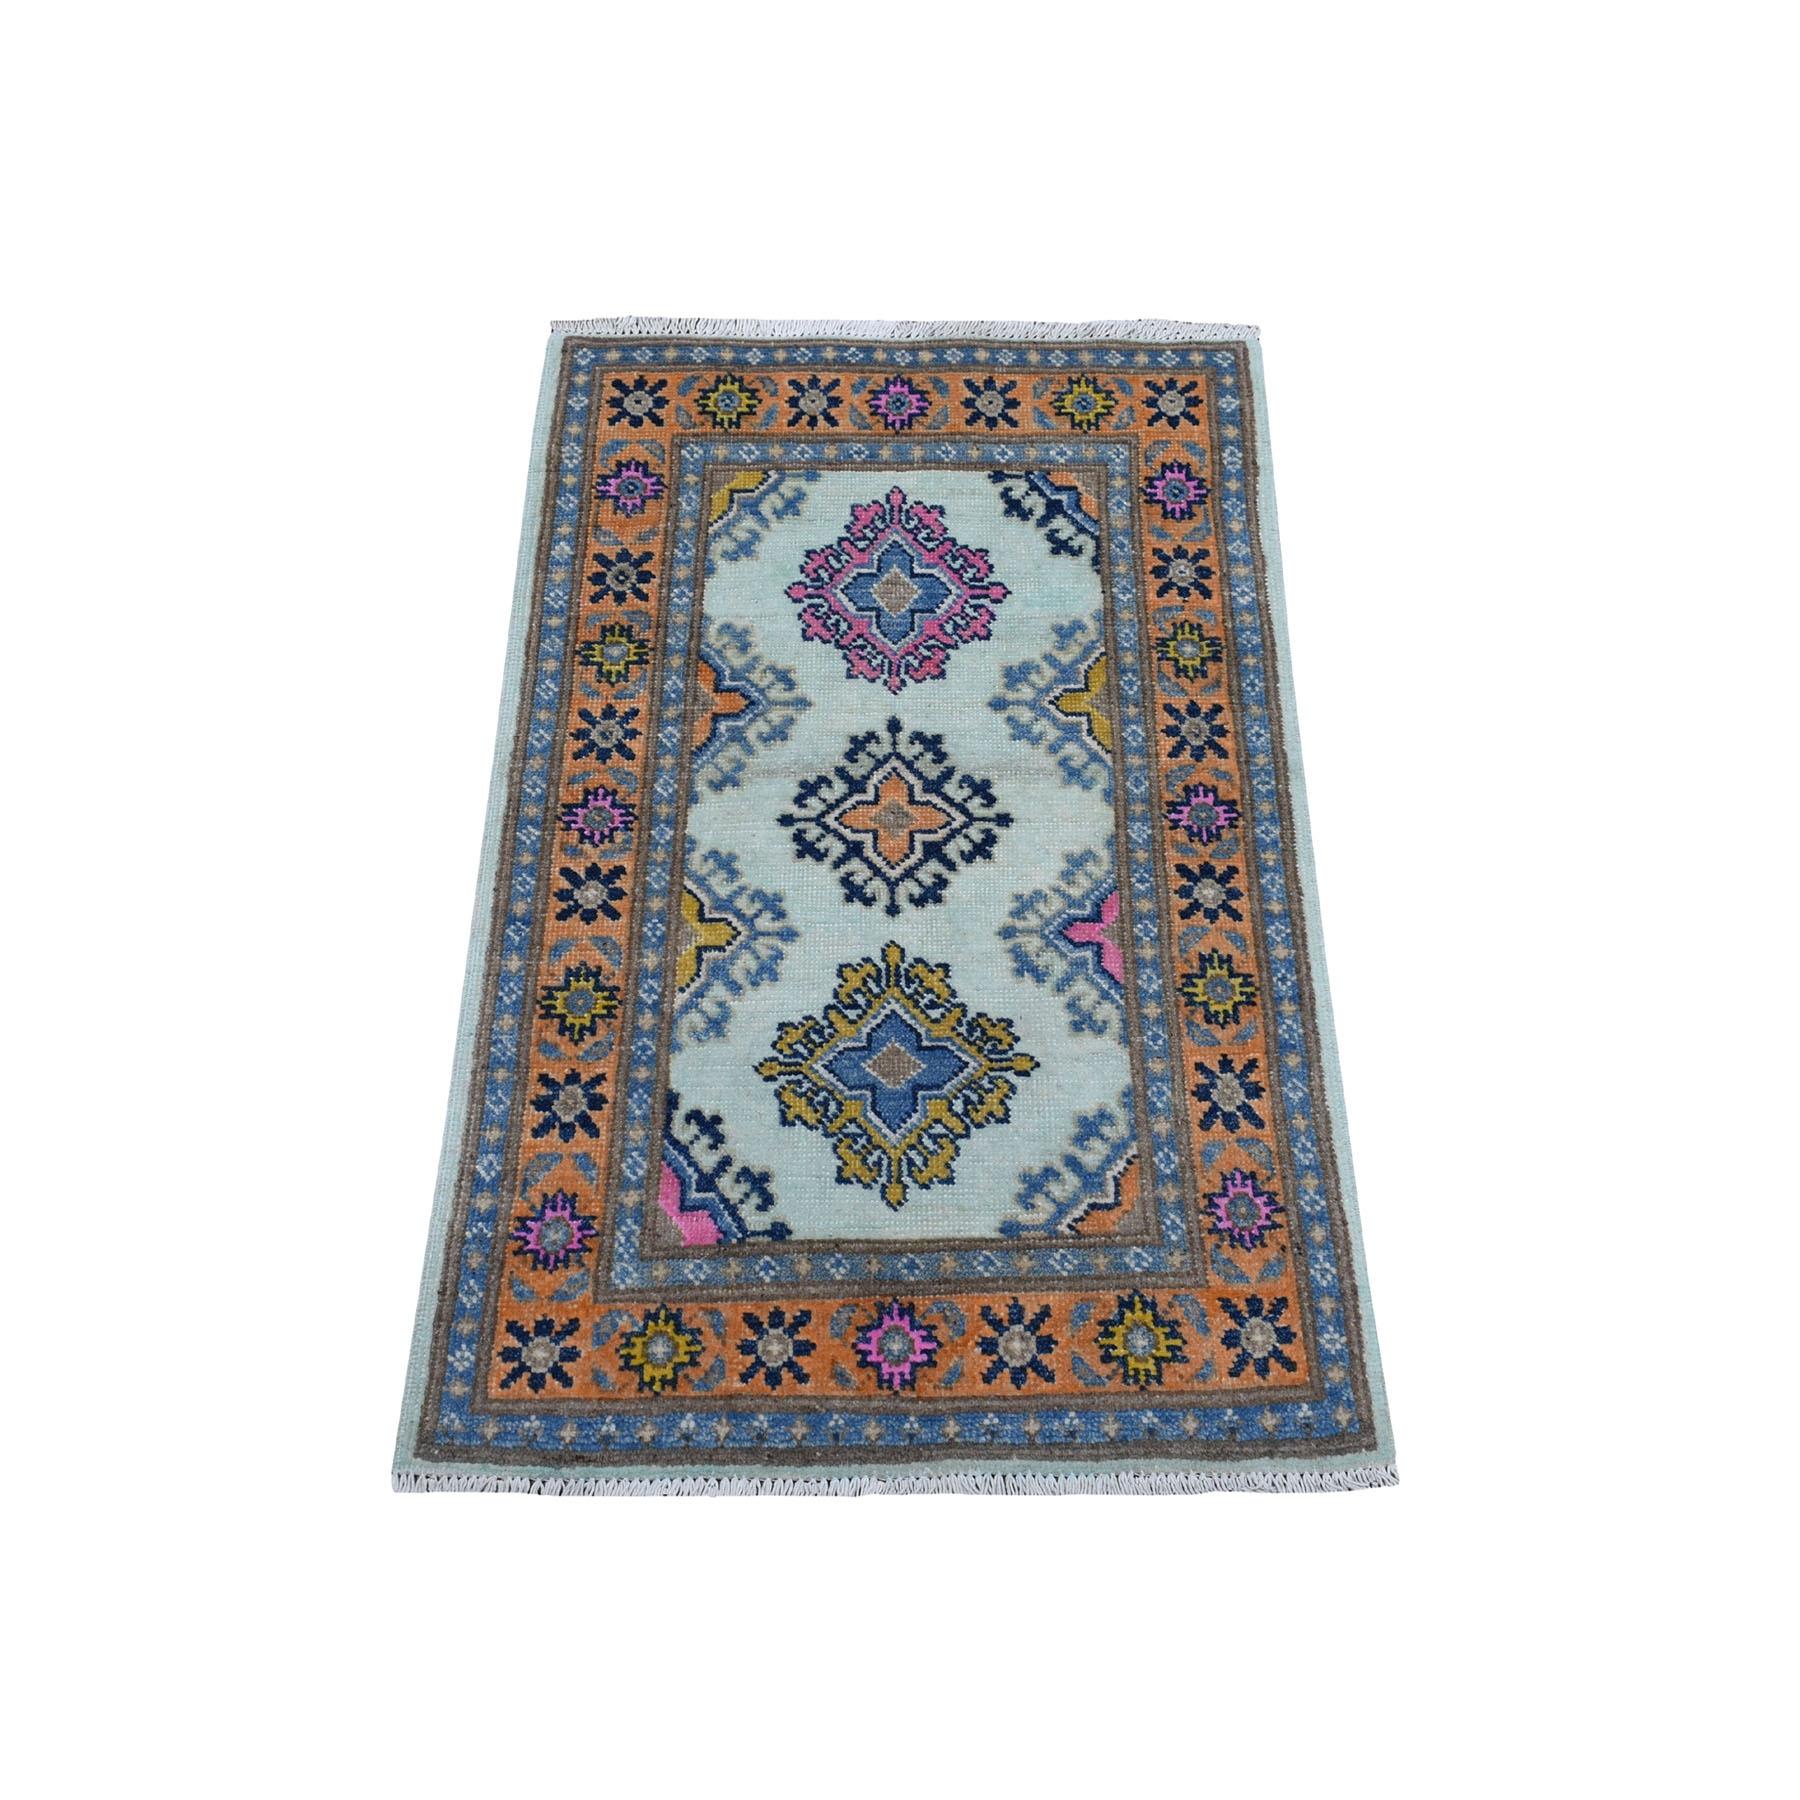 "2'X3'1"" Colorful Ivory Fusion Kazak Pure Wool Geometric Design Hand Knotted Oriental Rug moaec98e"